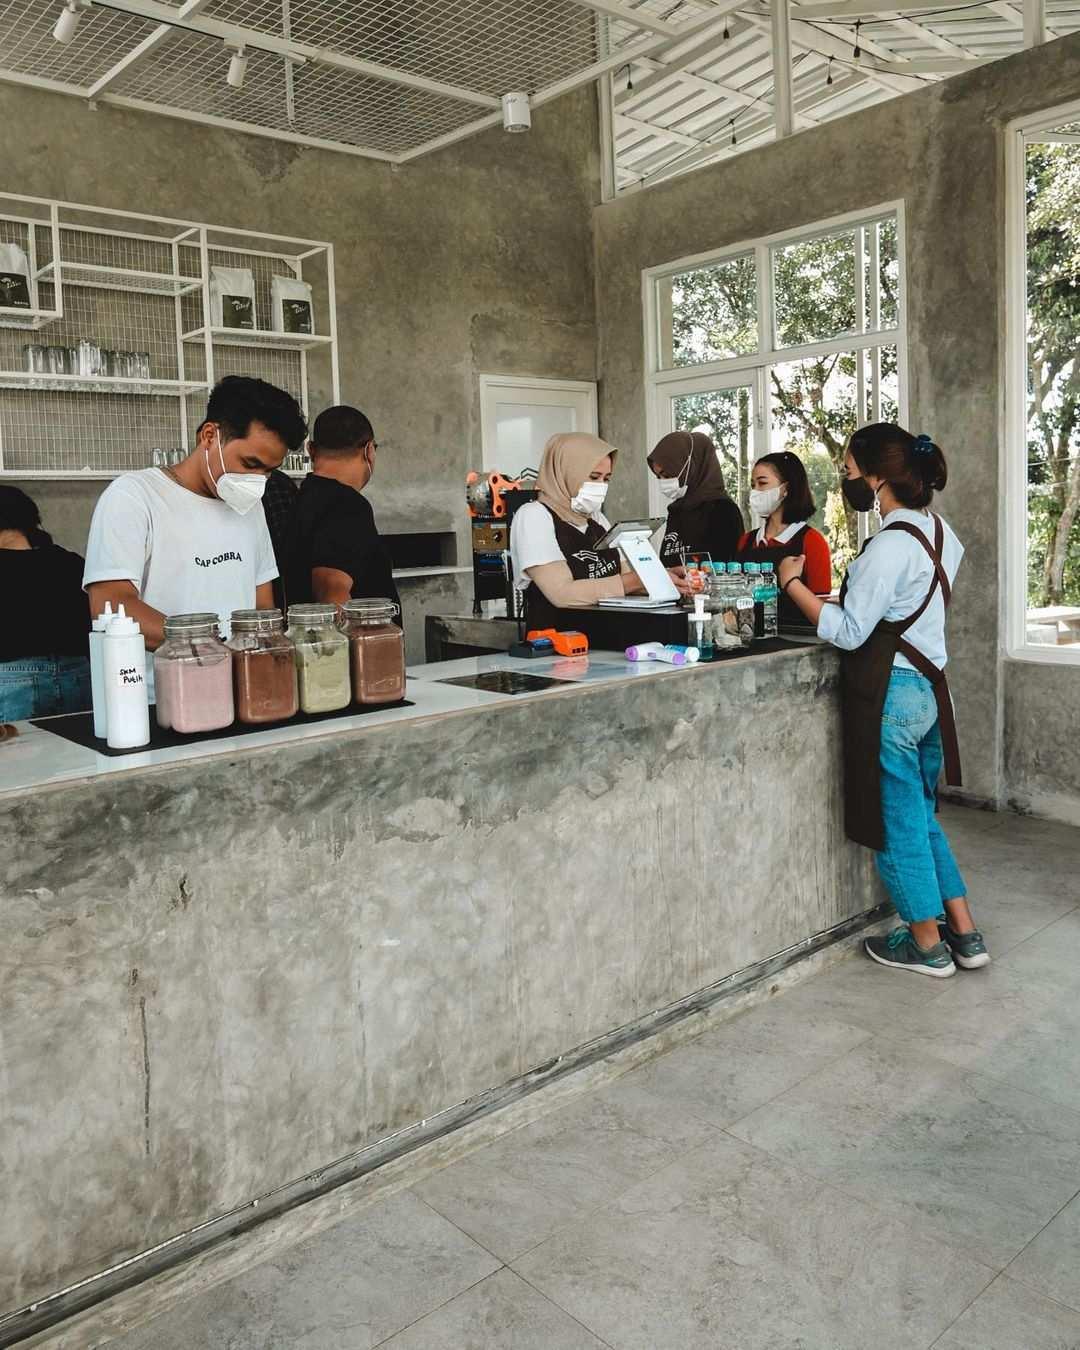 Konsep Industrial Cafe Di Sisi Barat Coffee Bogor Image From @nandarasman